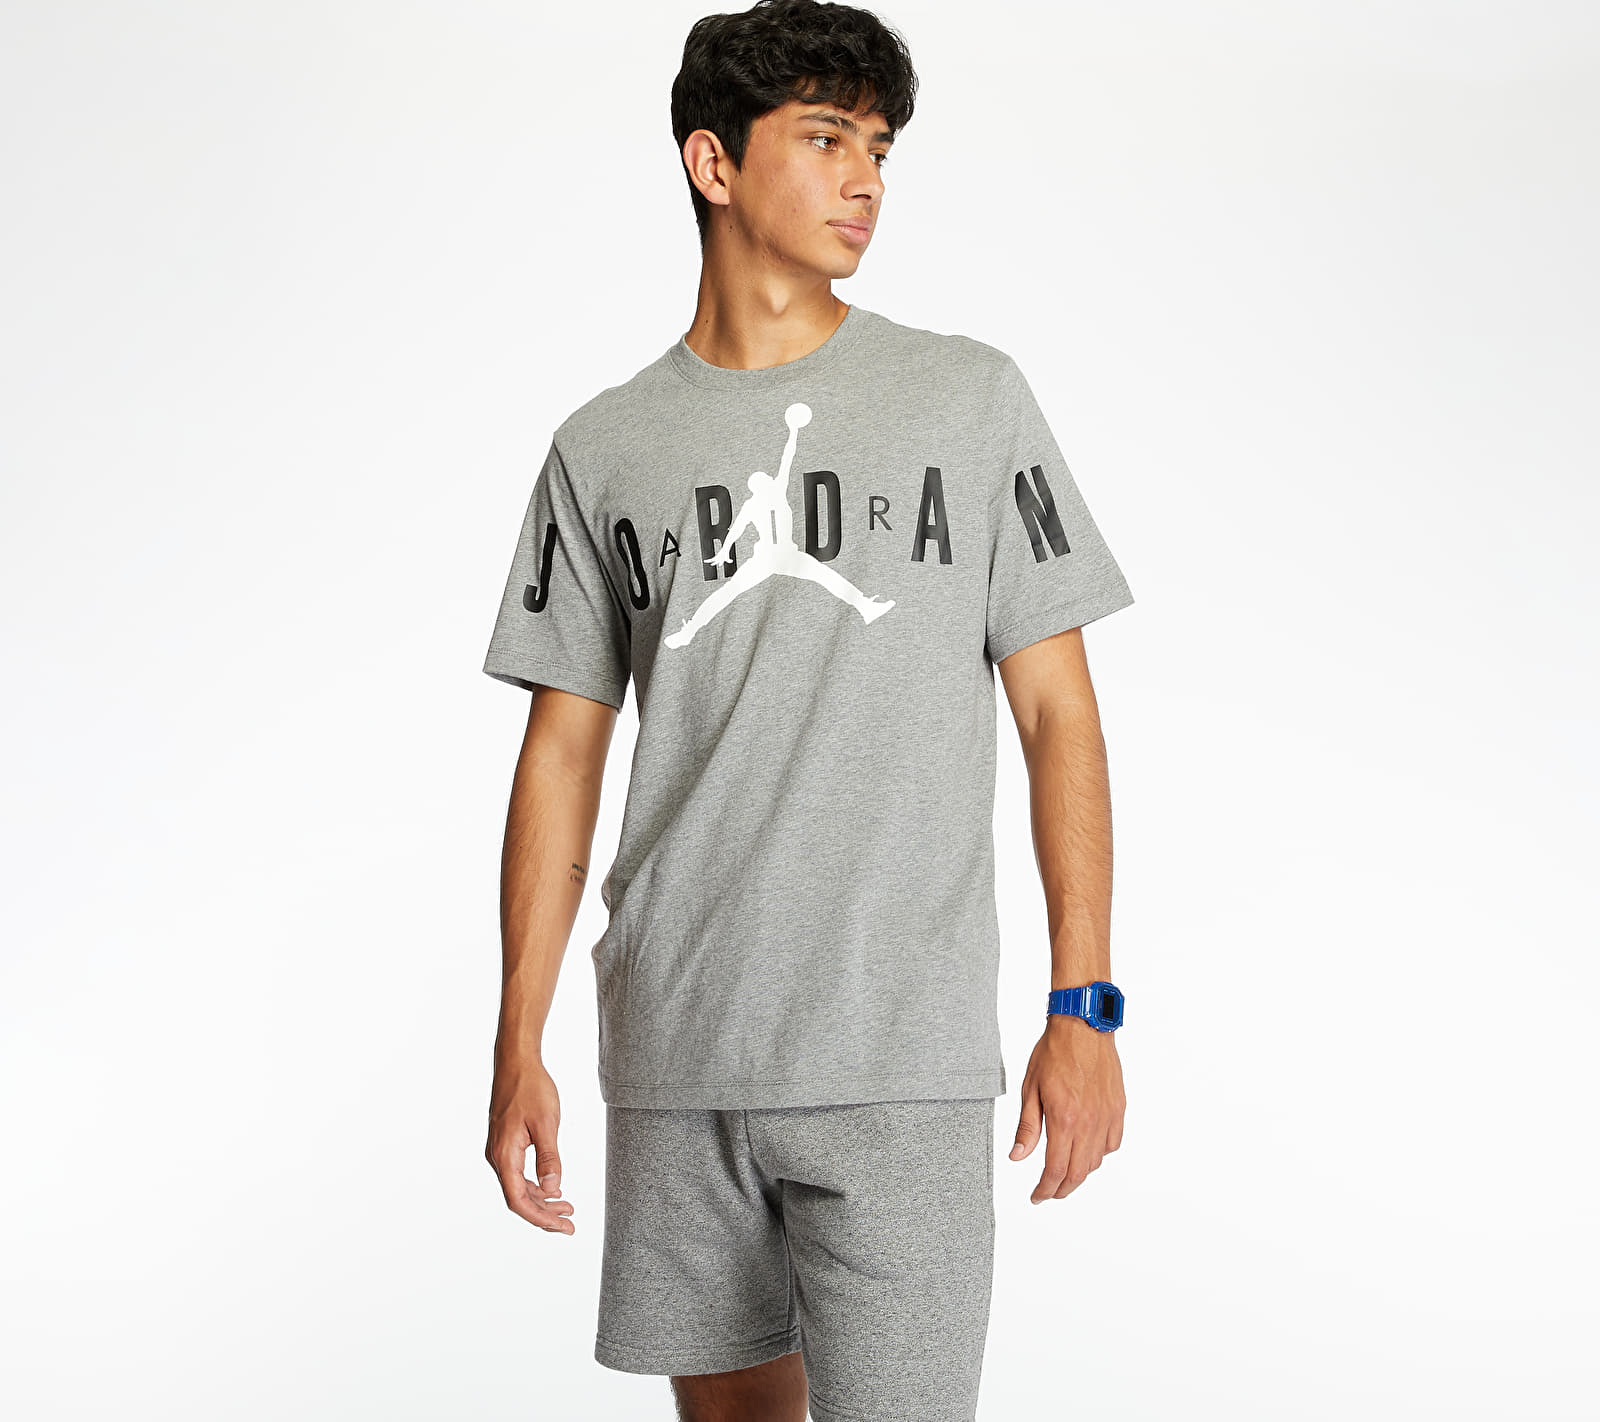 Jordan M J Brand Stretch Crew Tee Grey, Gray